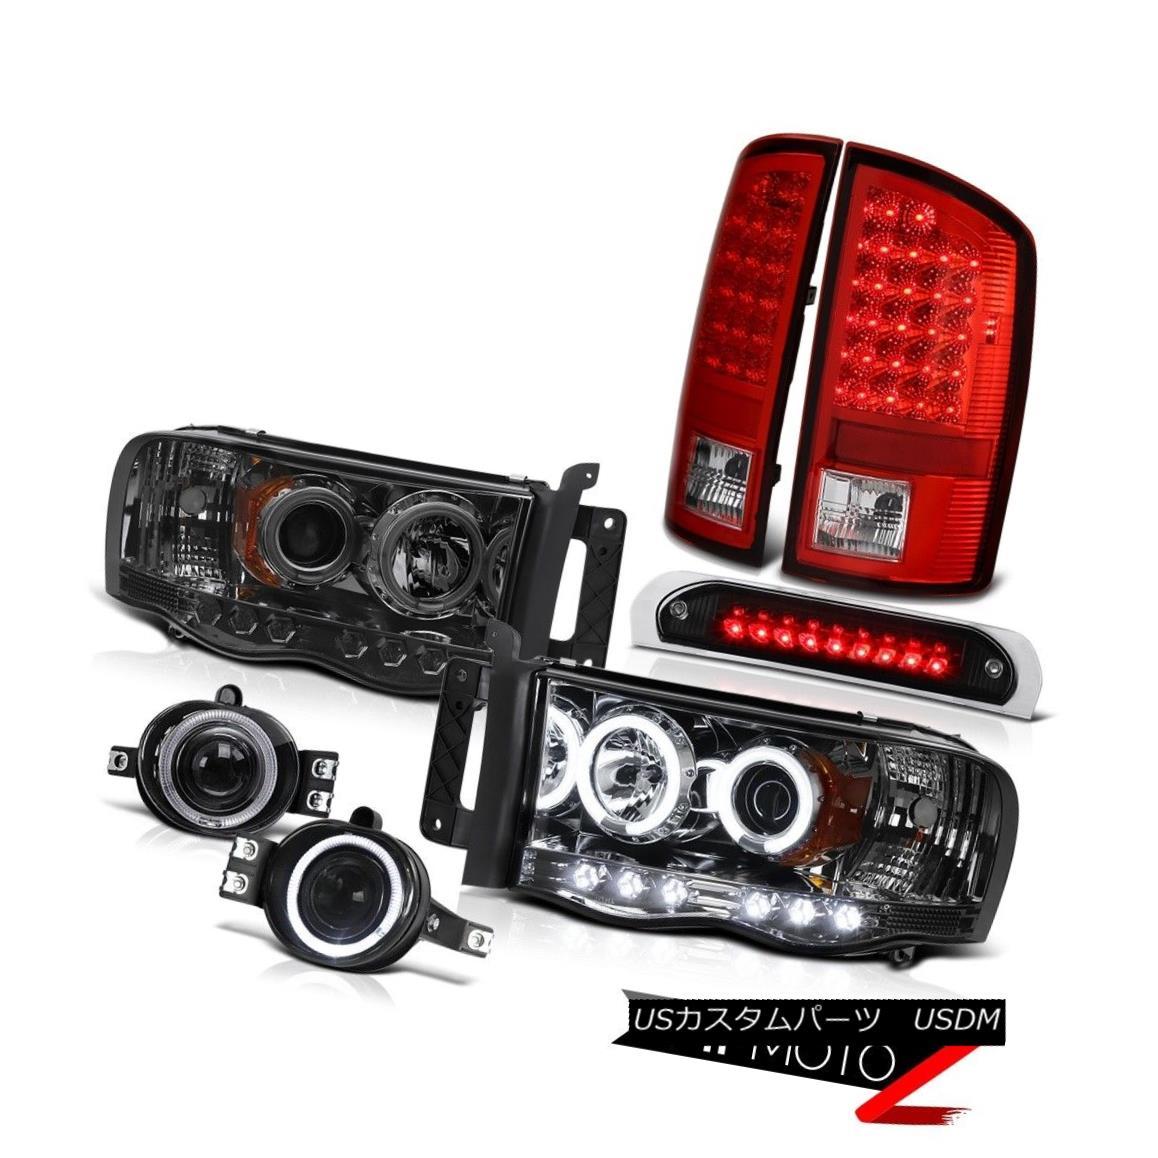 2002-2005 Ram Hemi Headlight Halo DRL LED Smoke Tail Light Chrome Fog Roof Brake